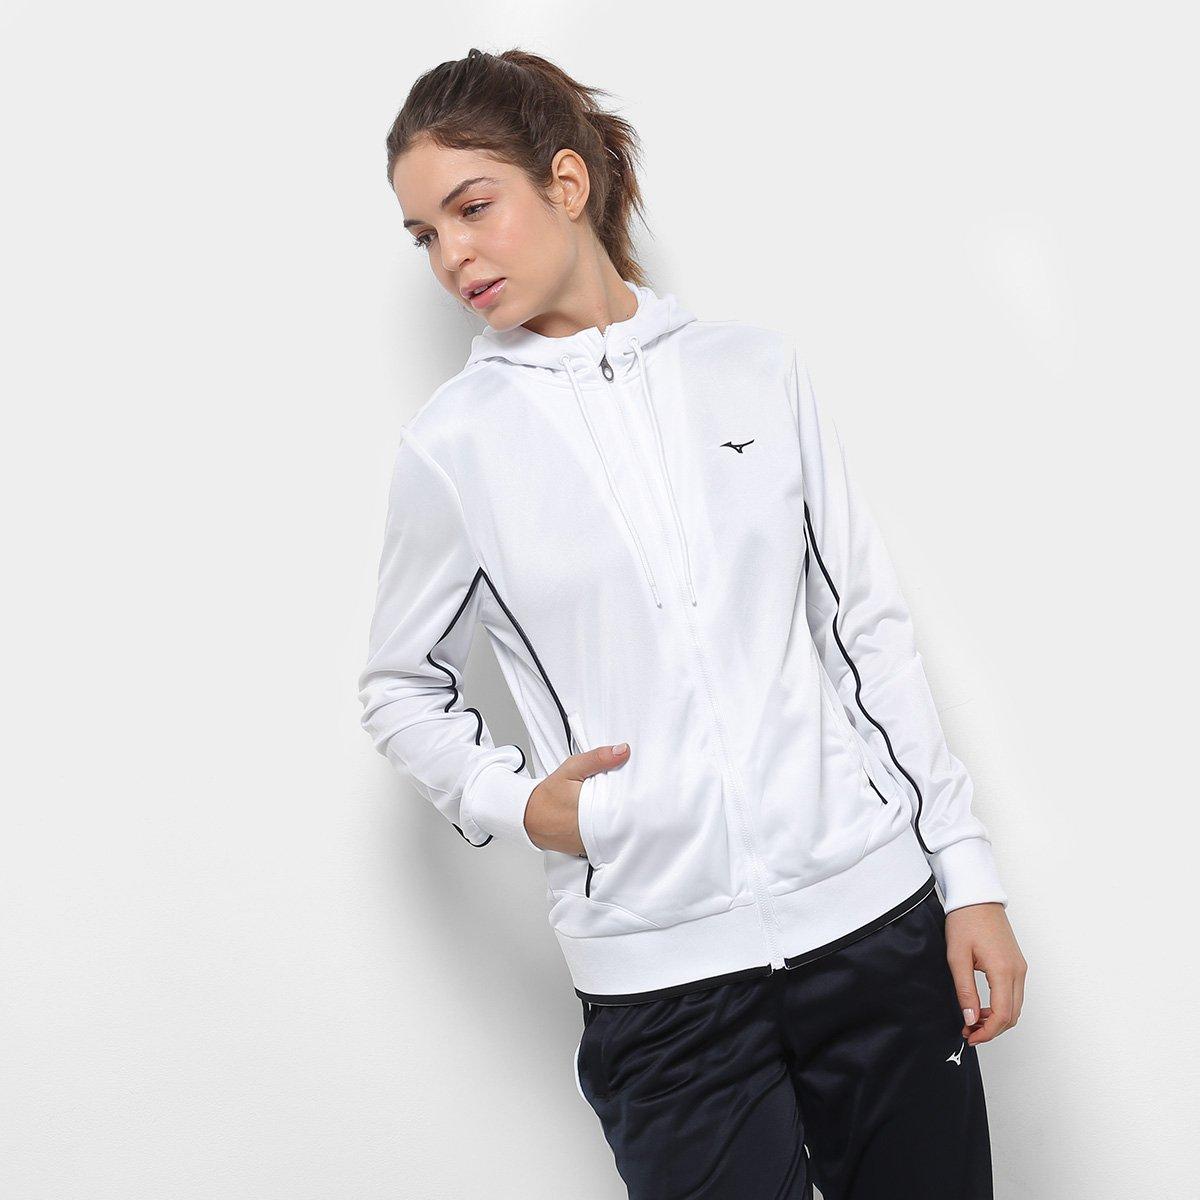 Agasalho Mizuno Pocket Feminino - Preto e Branco - Compre Agora ... 21a01eb0f056e